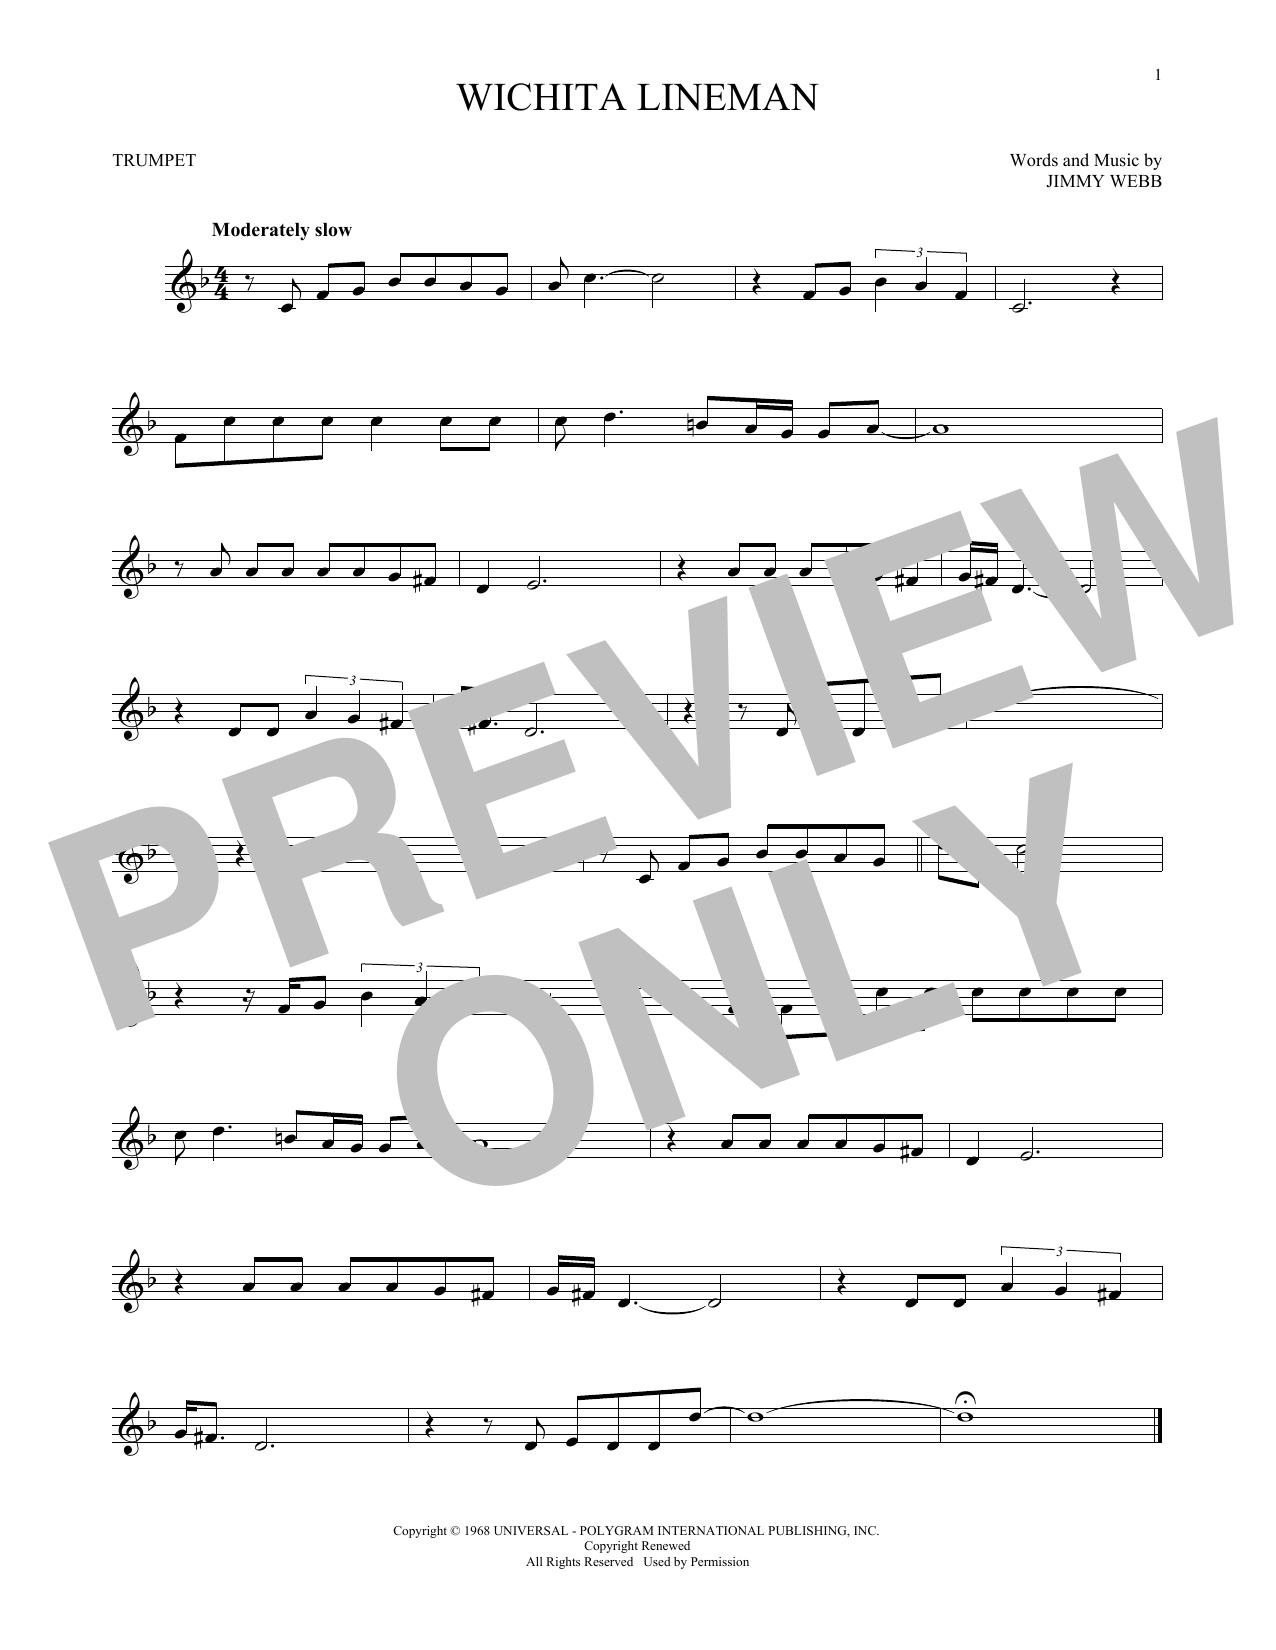 Wichita Lineman (Trumpet Solo)